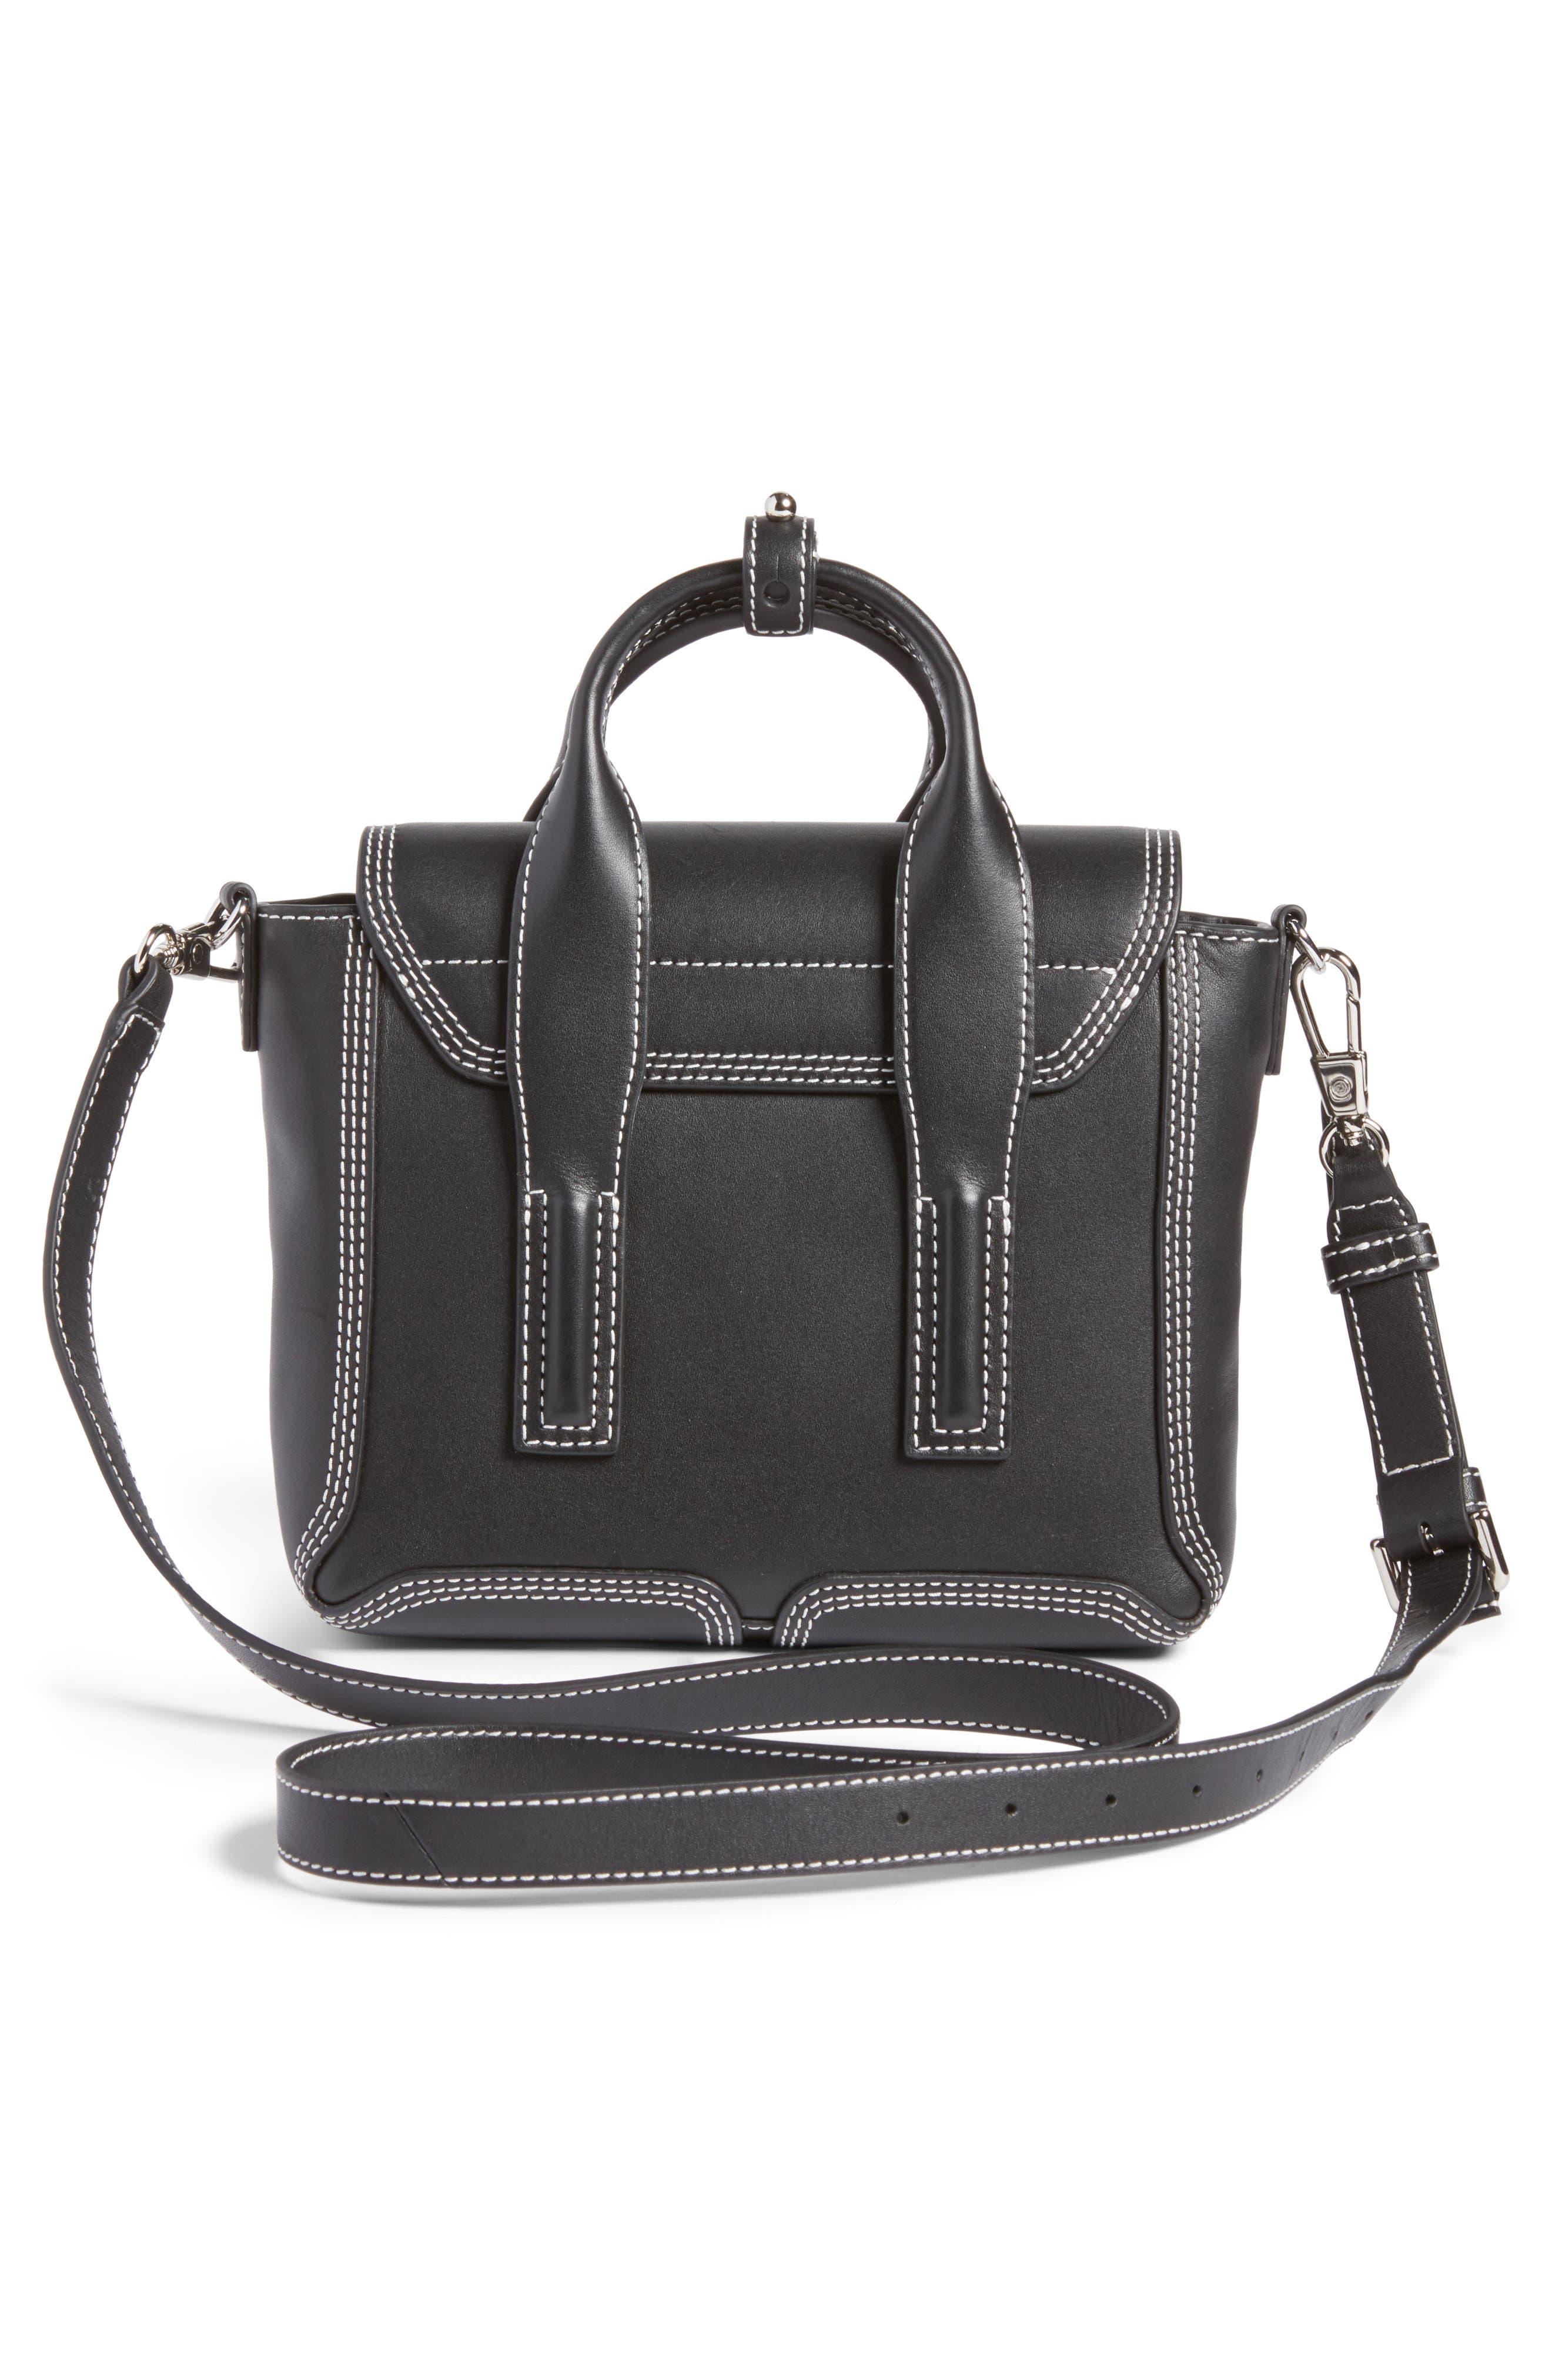 Alternate Image 2  - 3.1 Phillip Lim Mini Pashli Leather Satchel